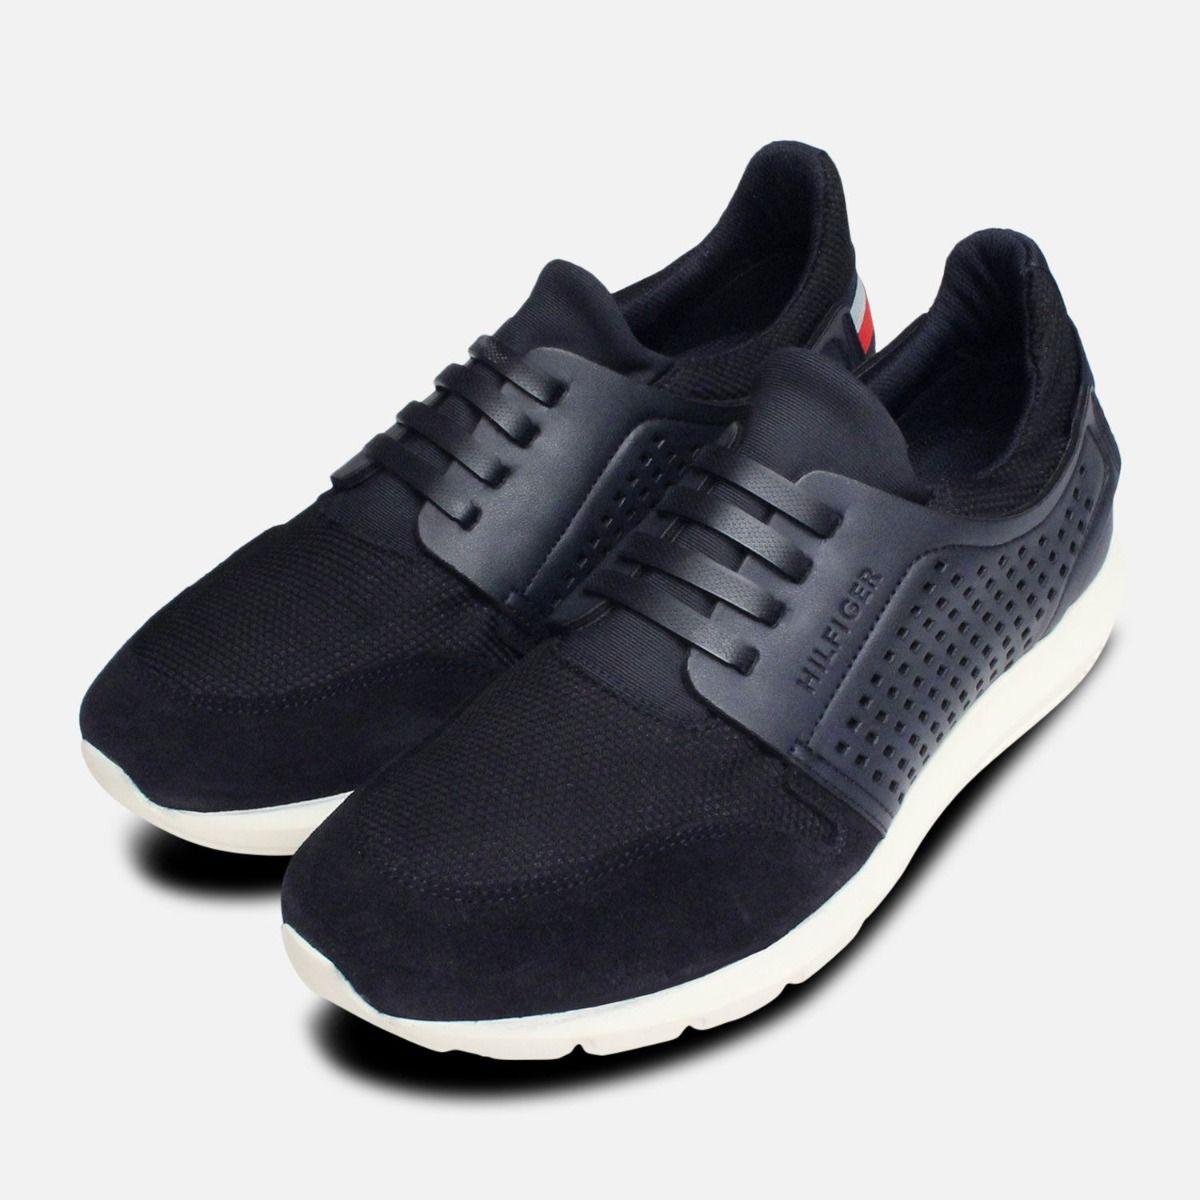 ac075b34f8 Tommy Hilfiger Extra Lightweight Dark Navy Blue Shoes